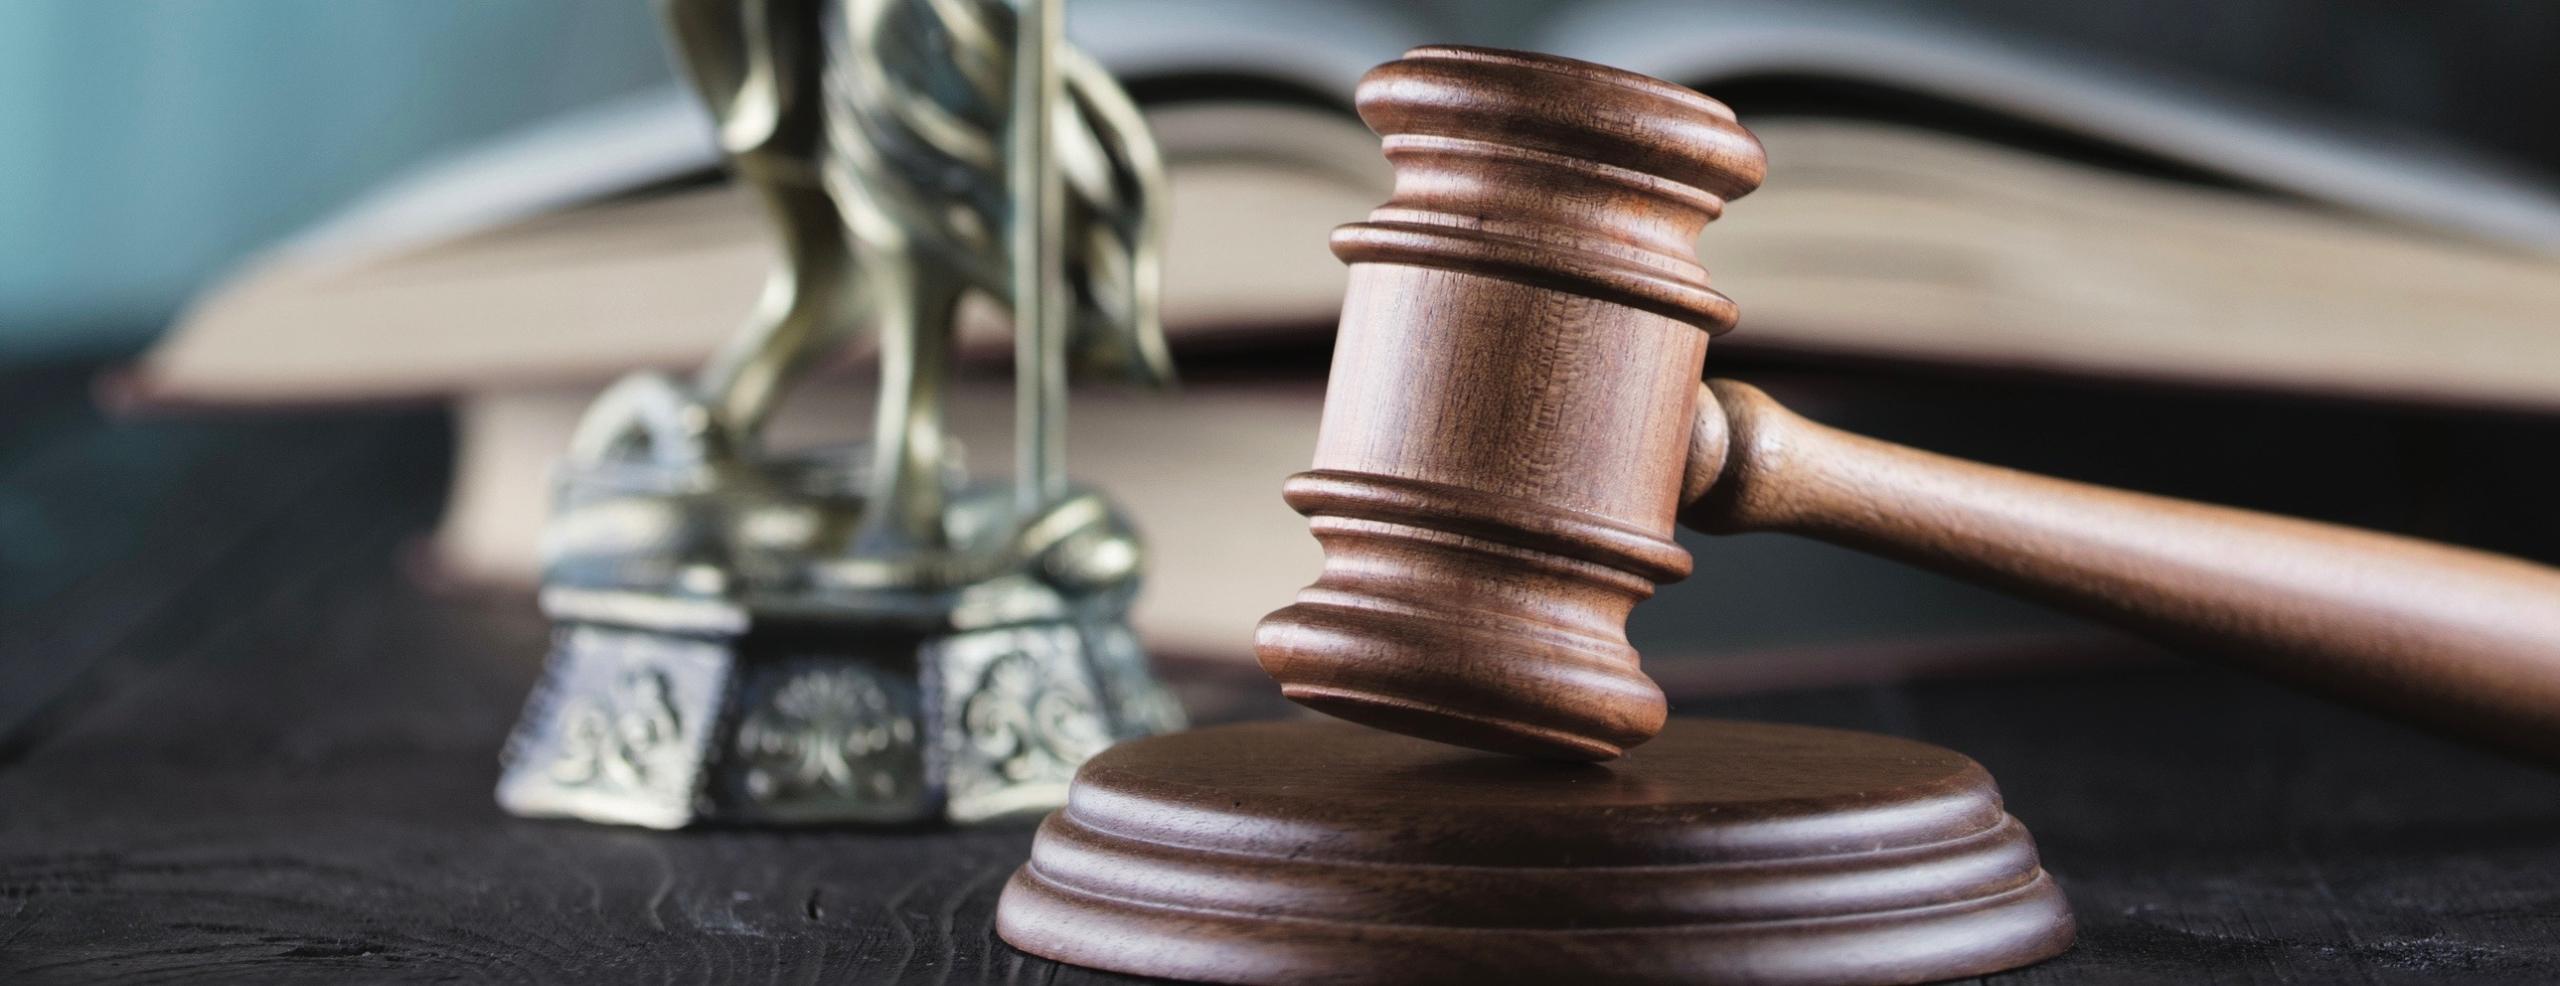 The Coastal Virginia Law Firm (@coastalvirginialaw) Cover Image